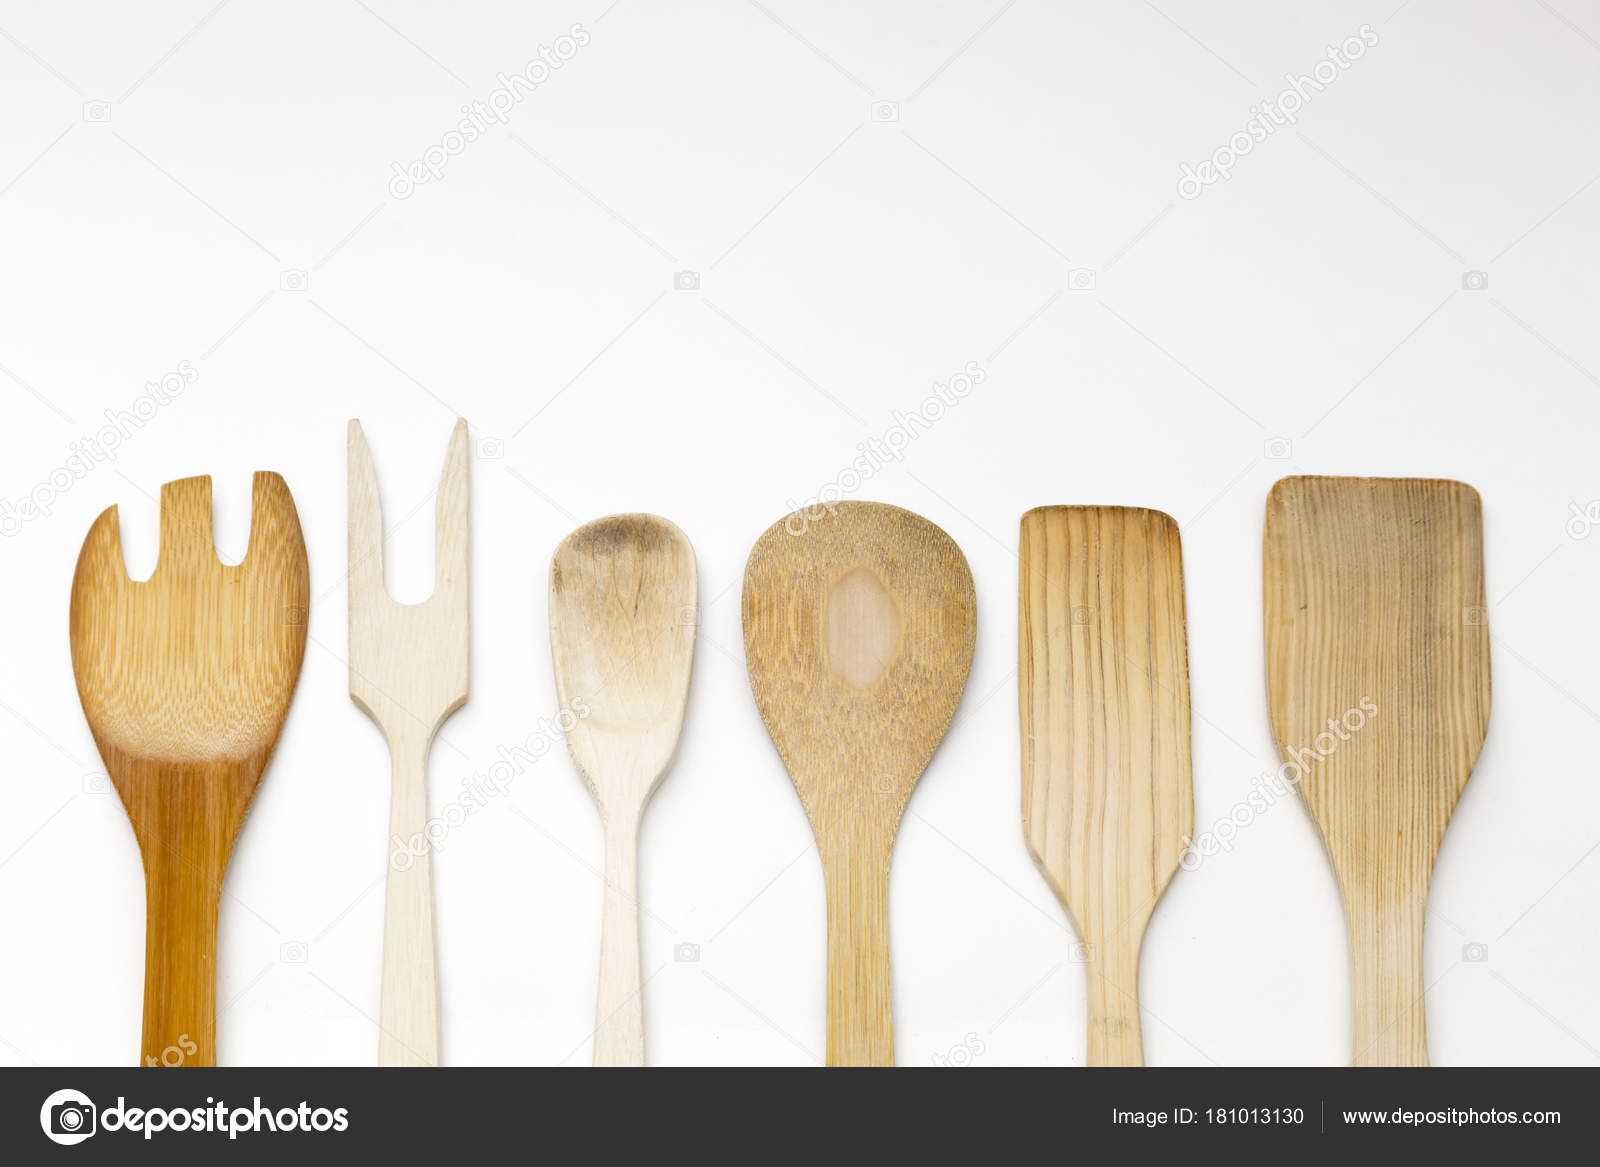 wood kitchen utensils — Stock Photo © benjasanz #181013130